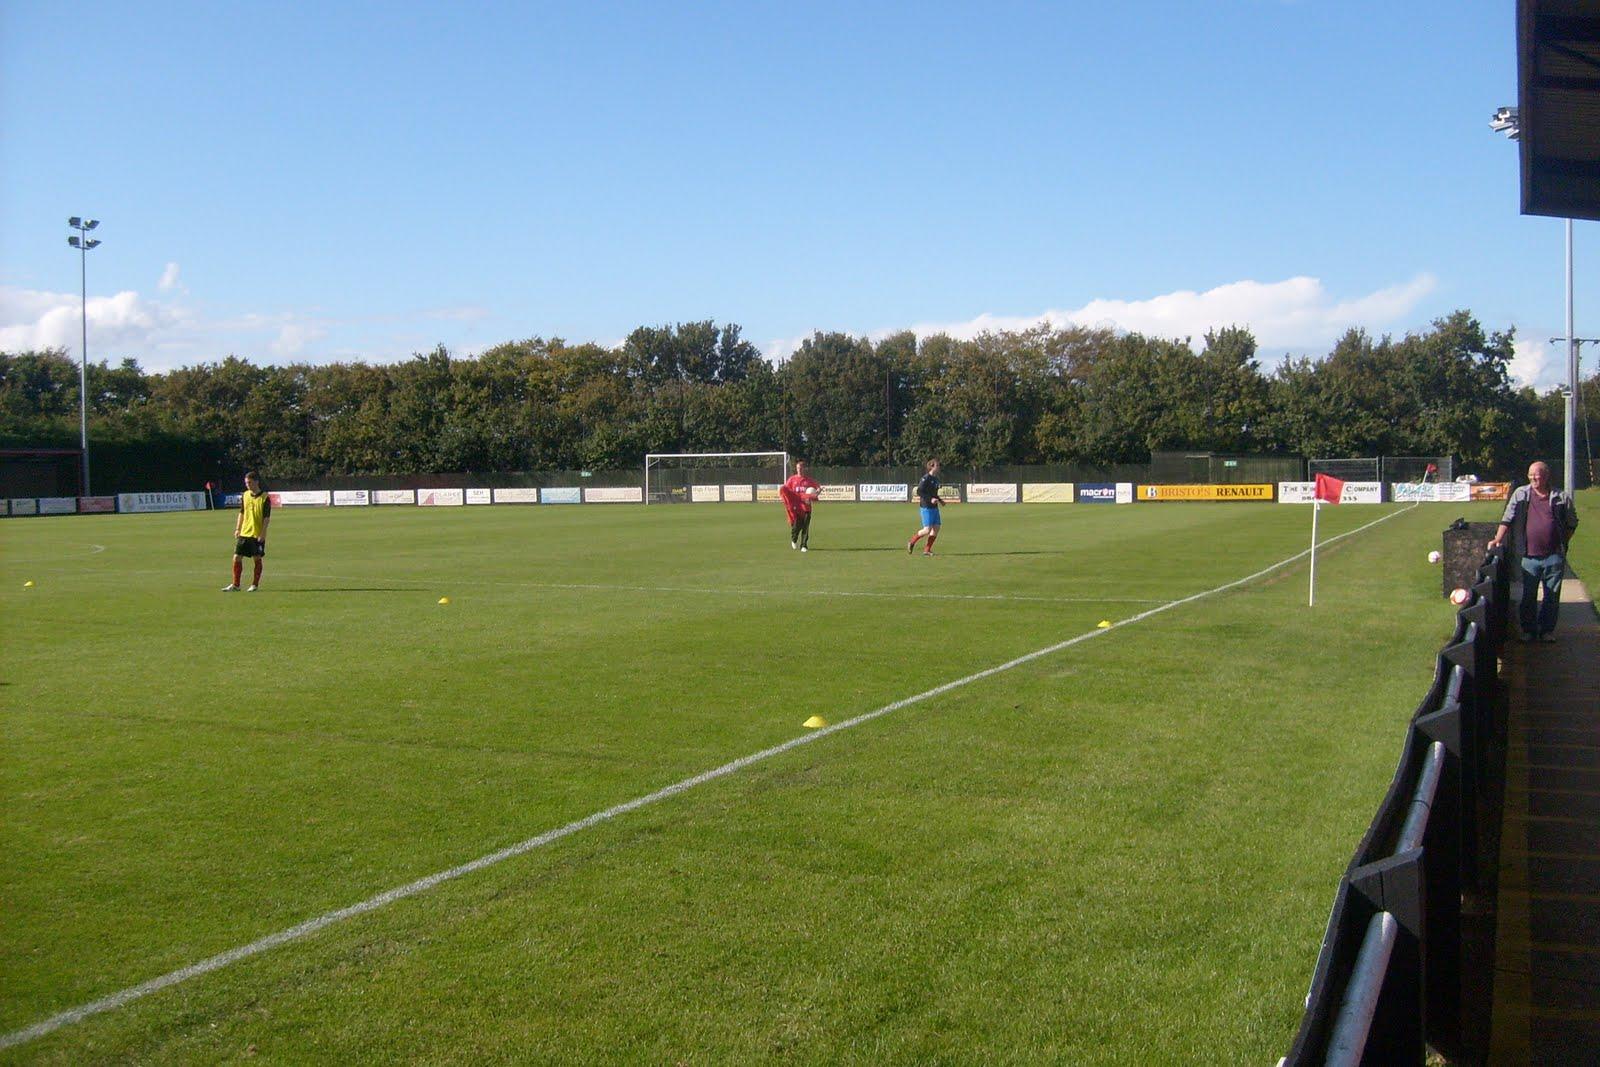 Football rambles september 2011 for 4 holland terrace needham ma